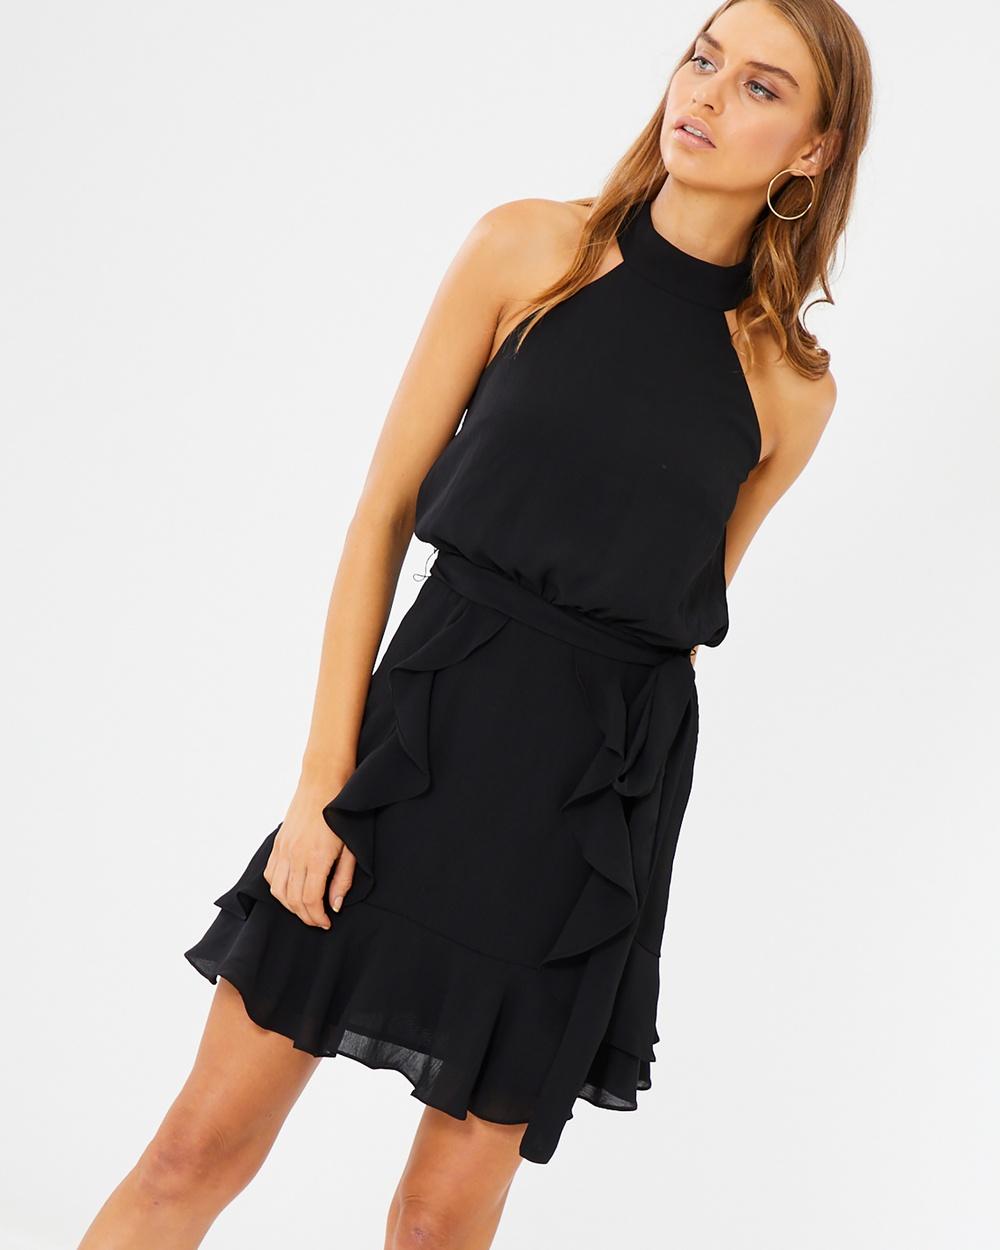 Tussah Izzy Ruffle Dress Dresses Black Izzy Ruffle Dress